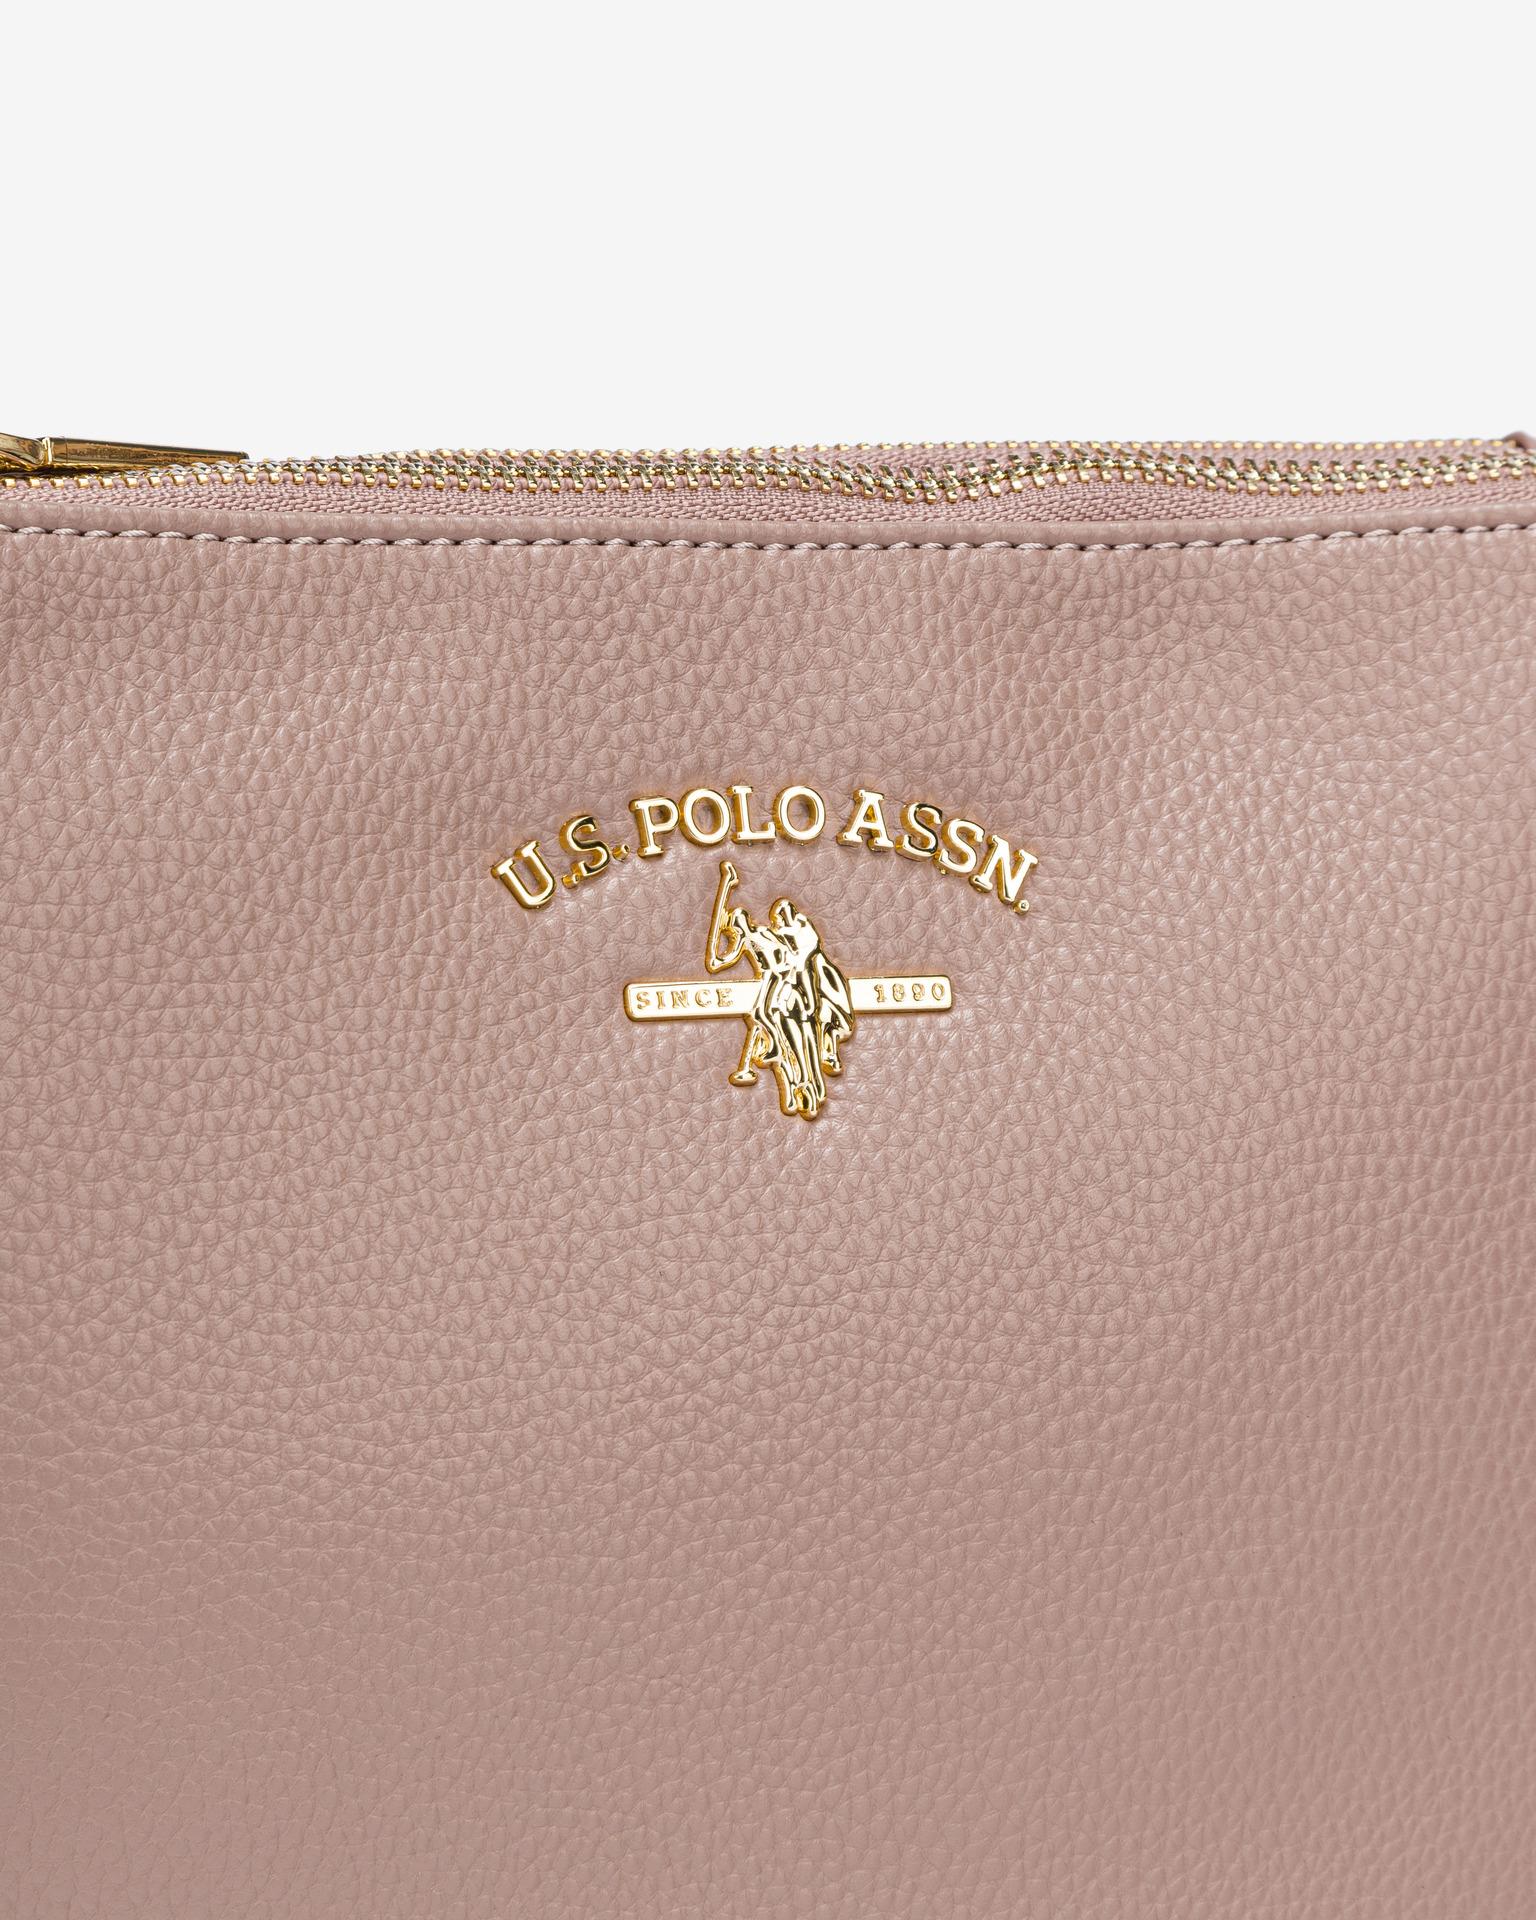 U.S. Polo Assn. Borsetta donna rosa  U.S.